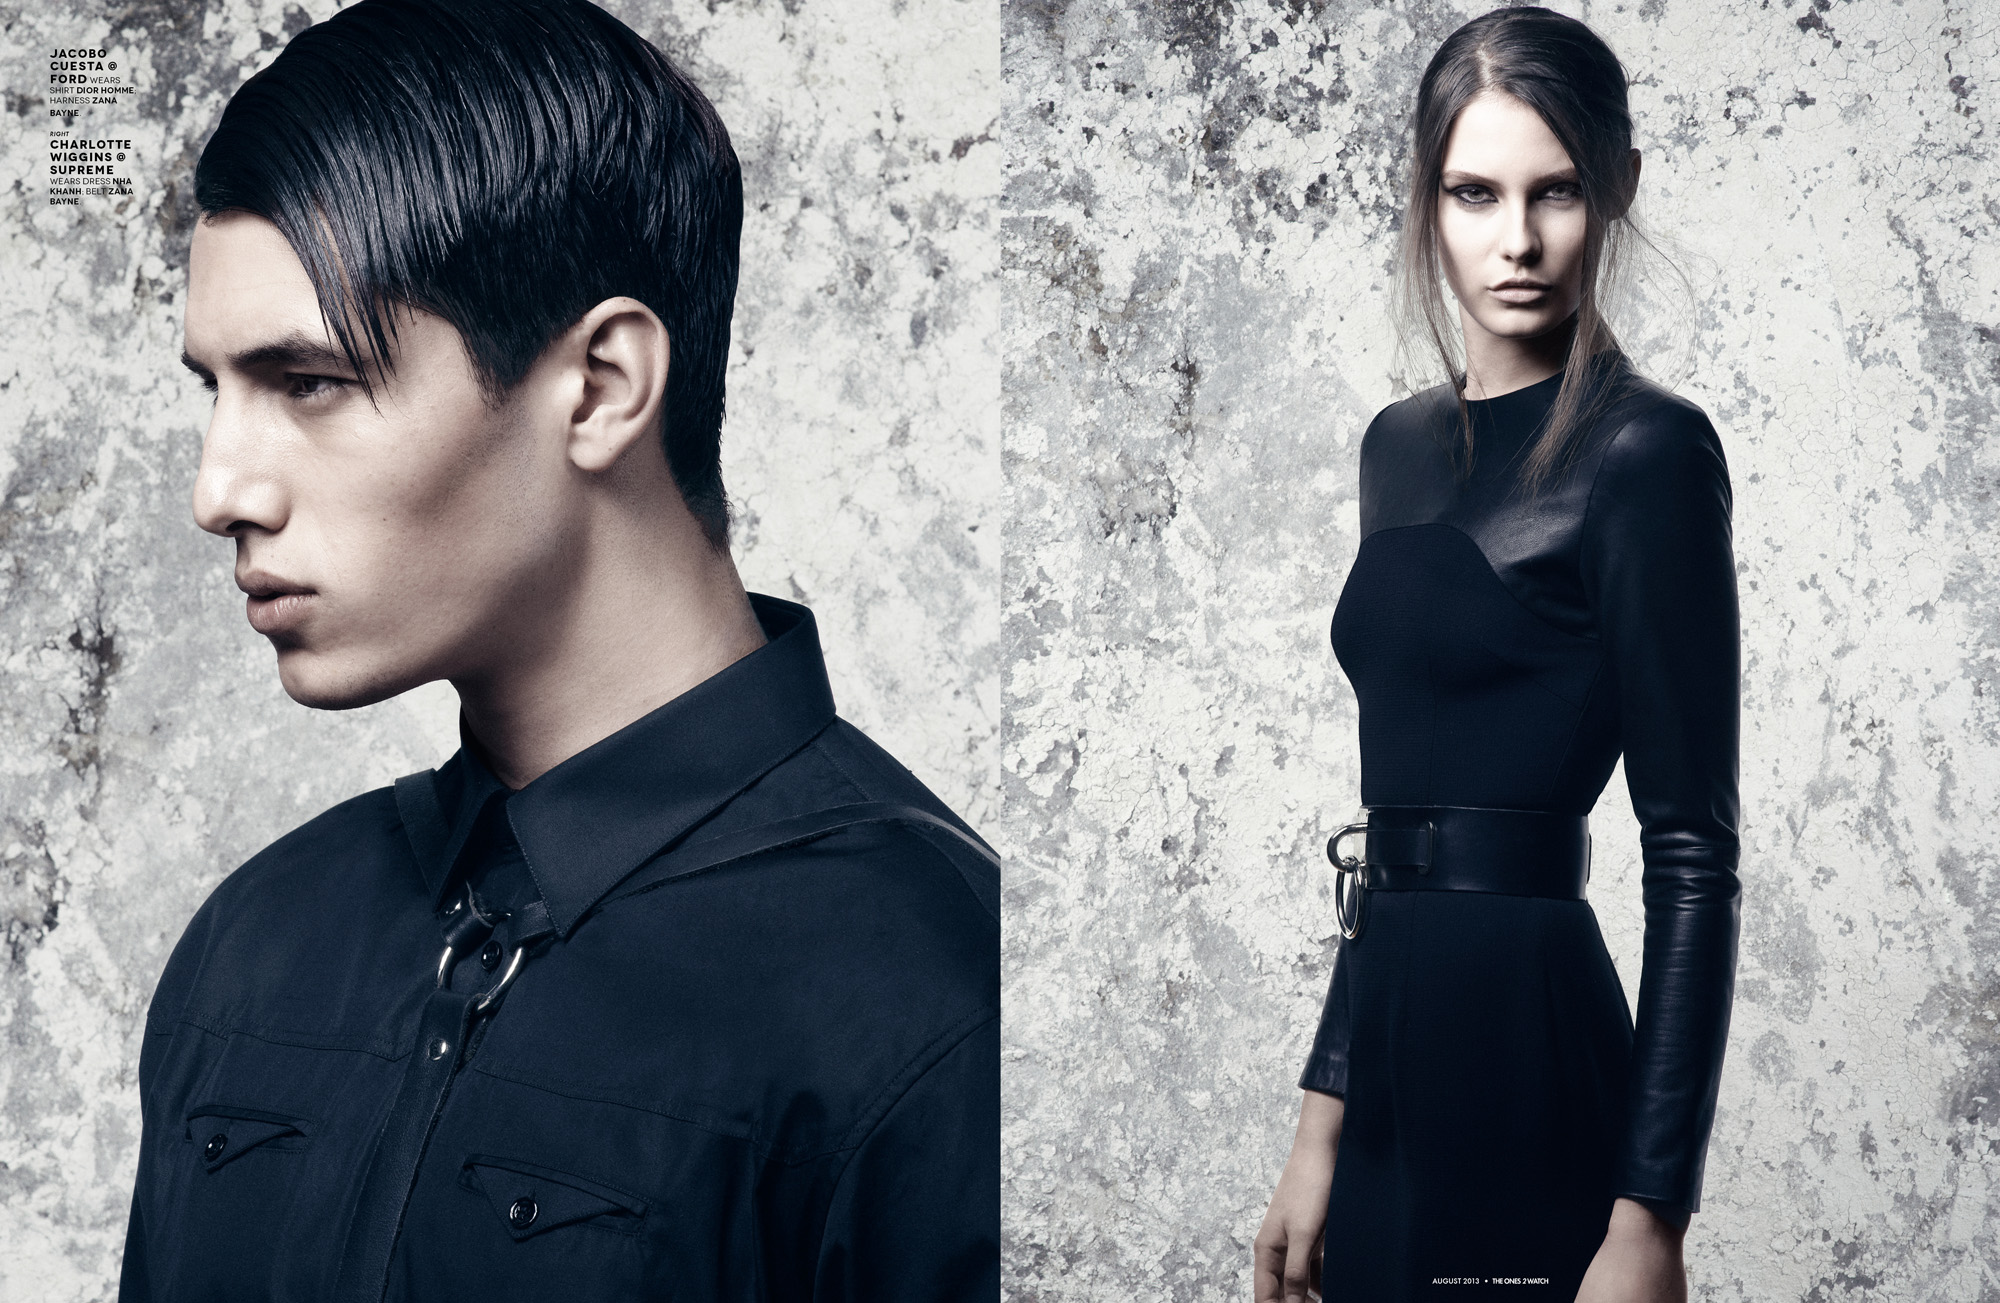 Charlotte Wiggins @ Supreme wears dress Nha Khanh; belt Zana Bayne.  Right: Jacobo Cuesta @ Ford wears shirt Dior Homme; harness Zana Bayne.